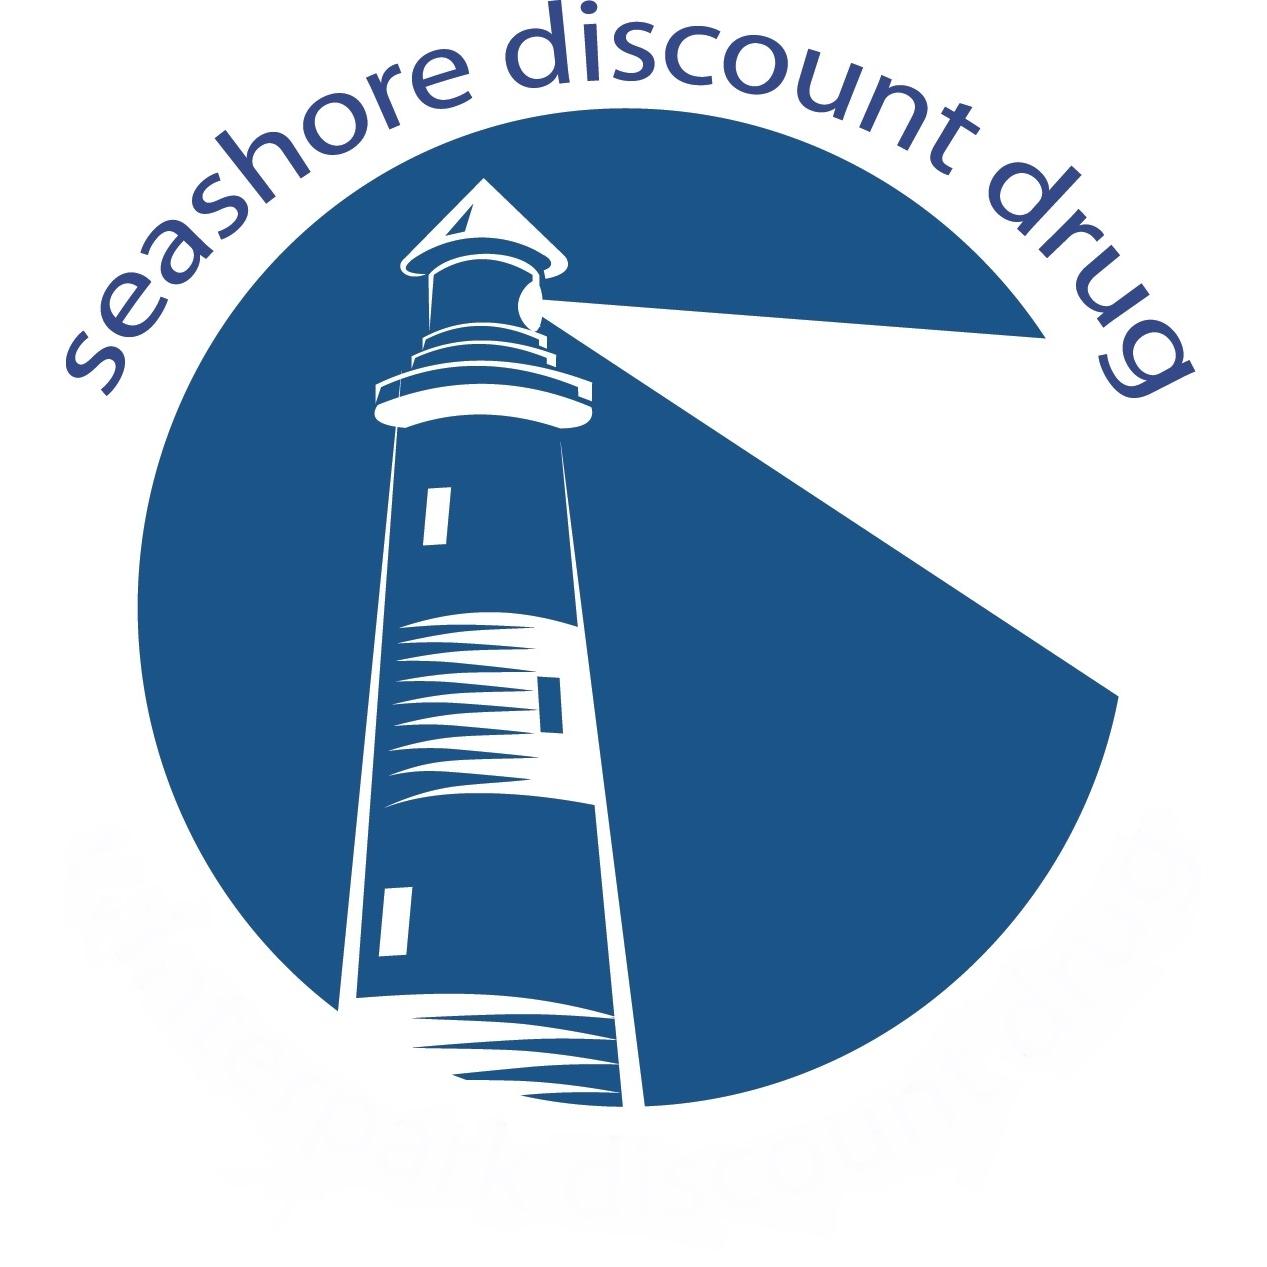 Seashore Drugs, Inc.